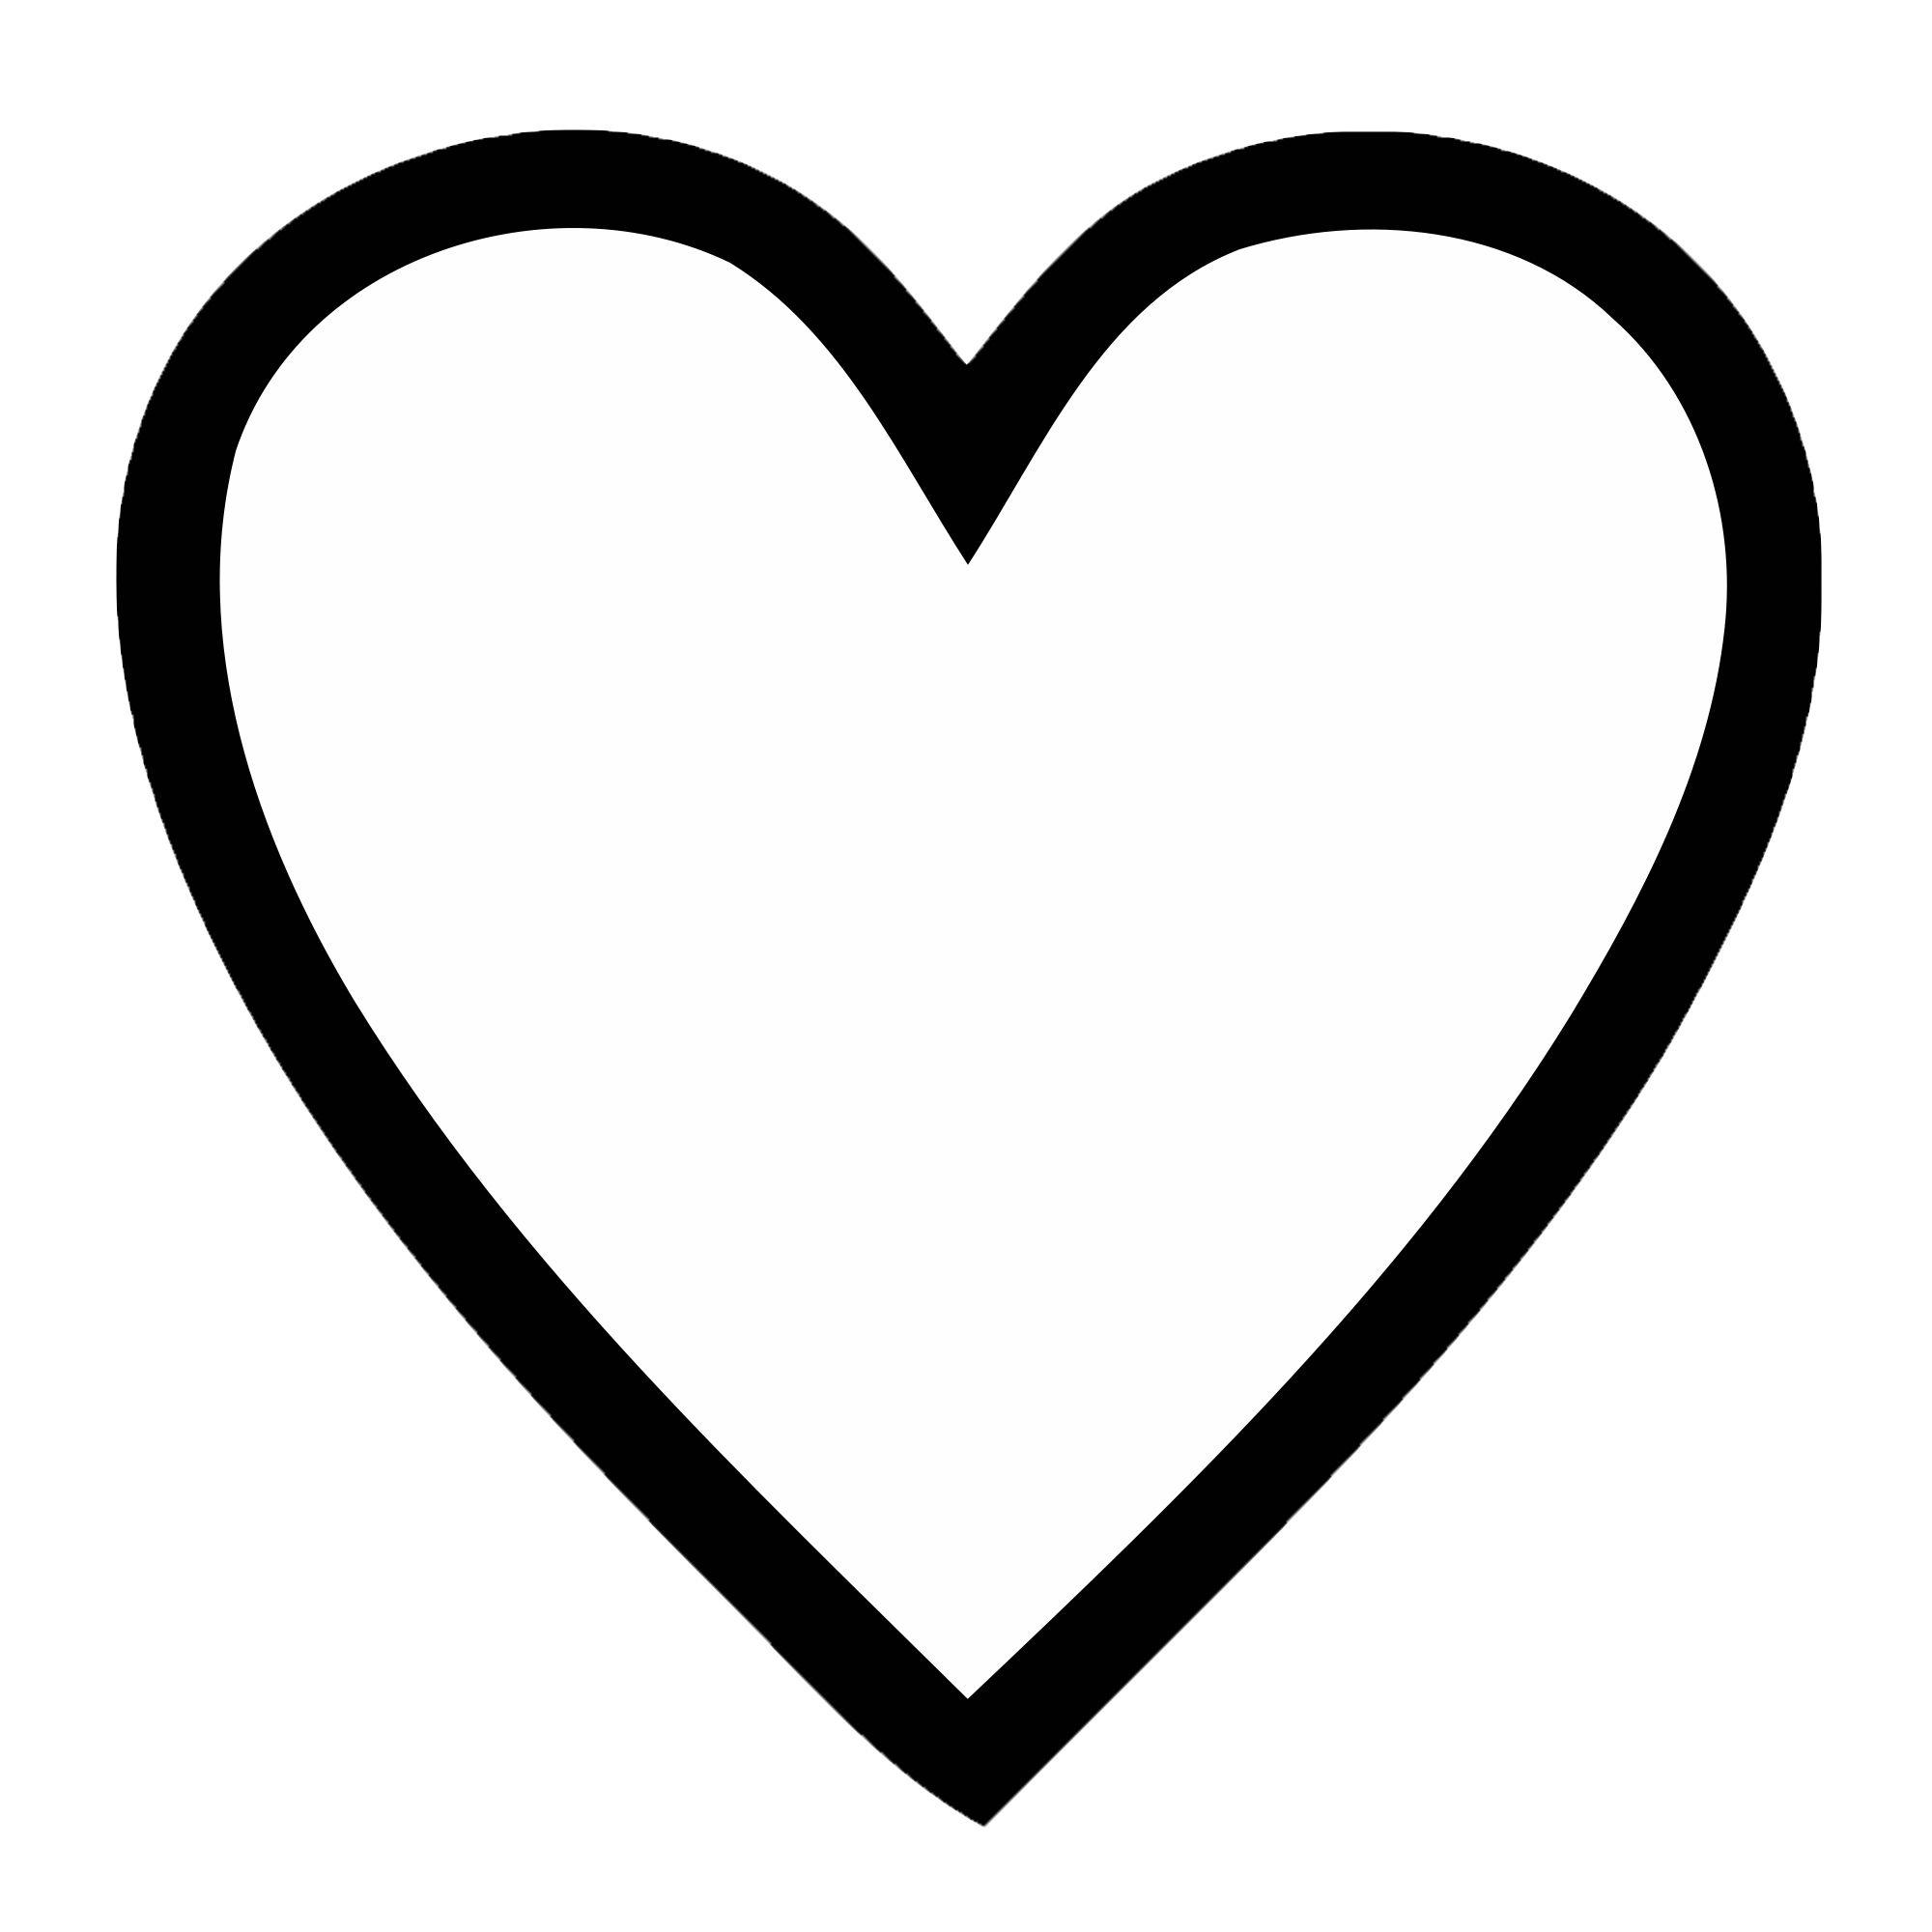 Heart Transparent Nisan Okul Oncesi Fotograf